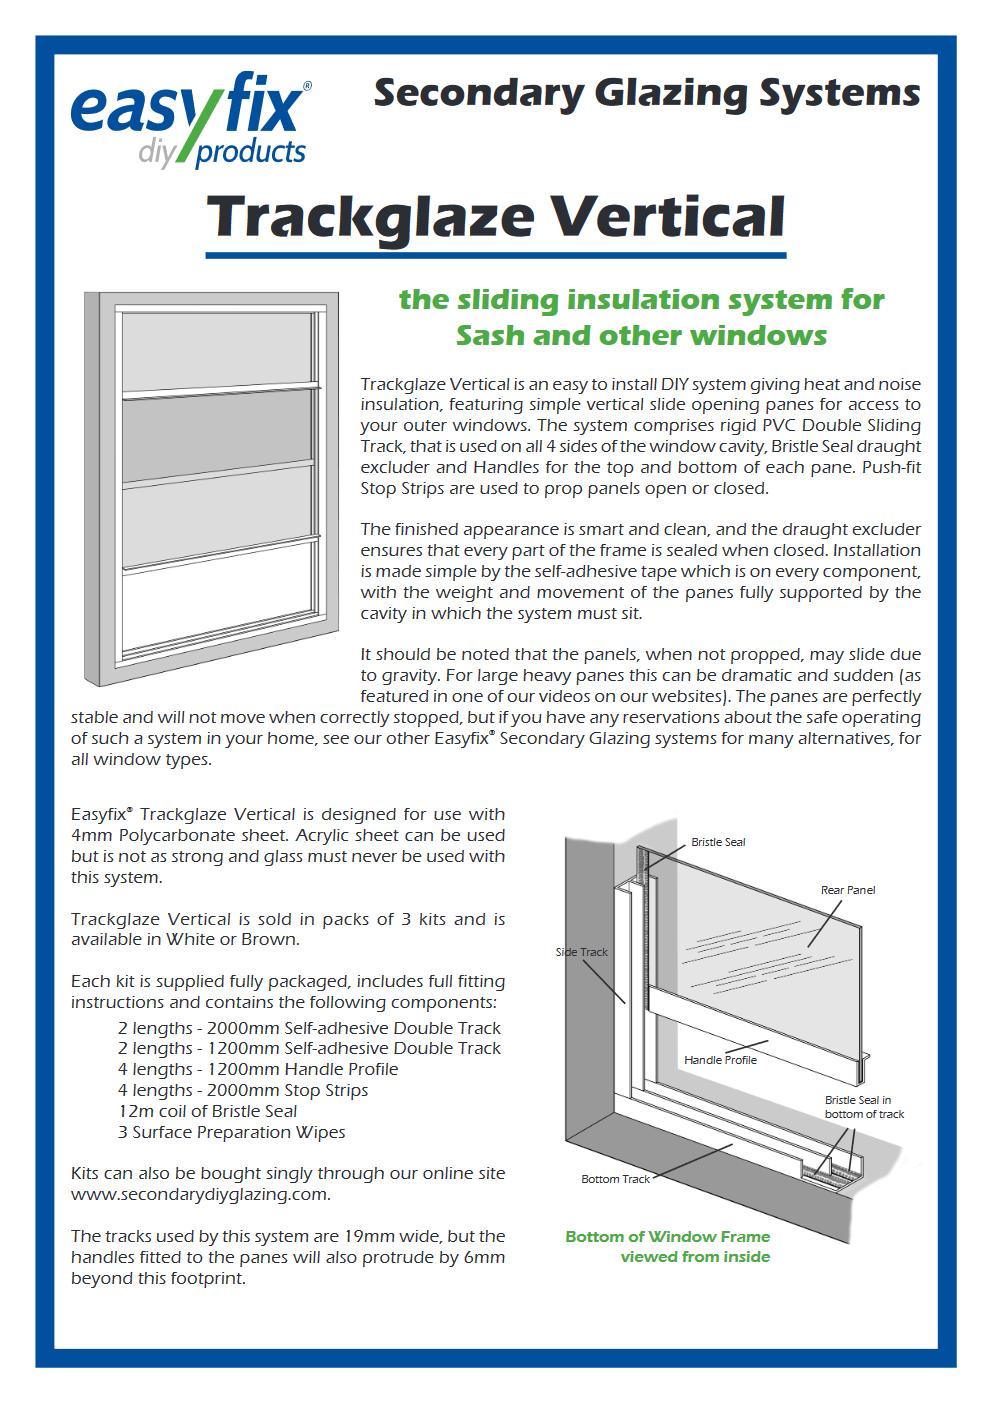 easyfix trackglaze vertical eleaflet pdf